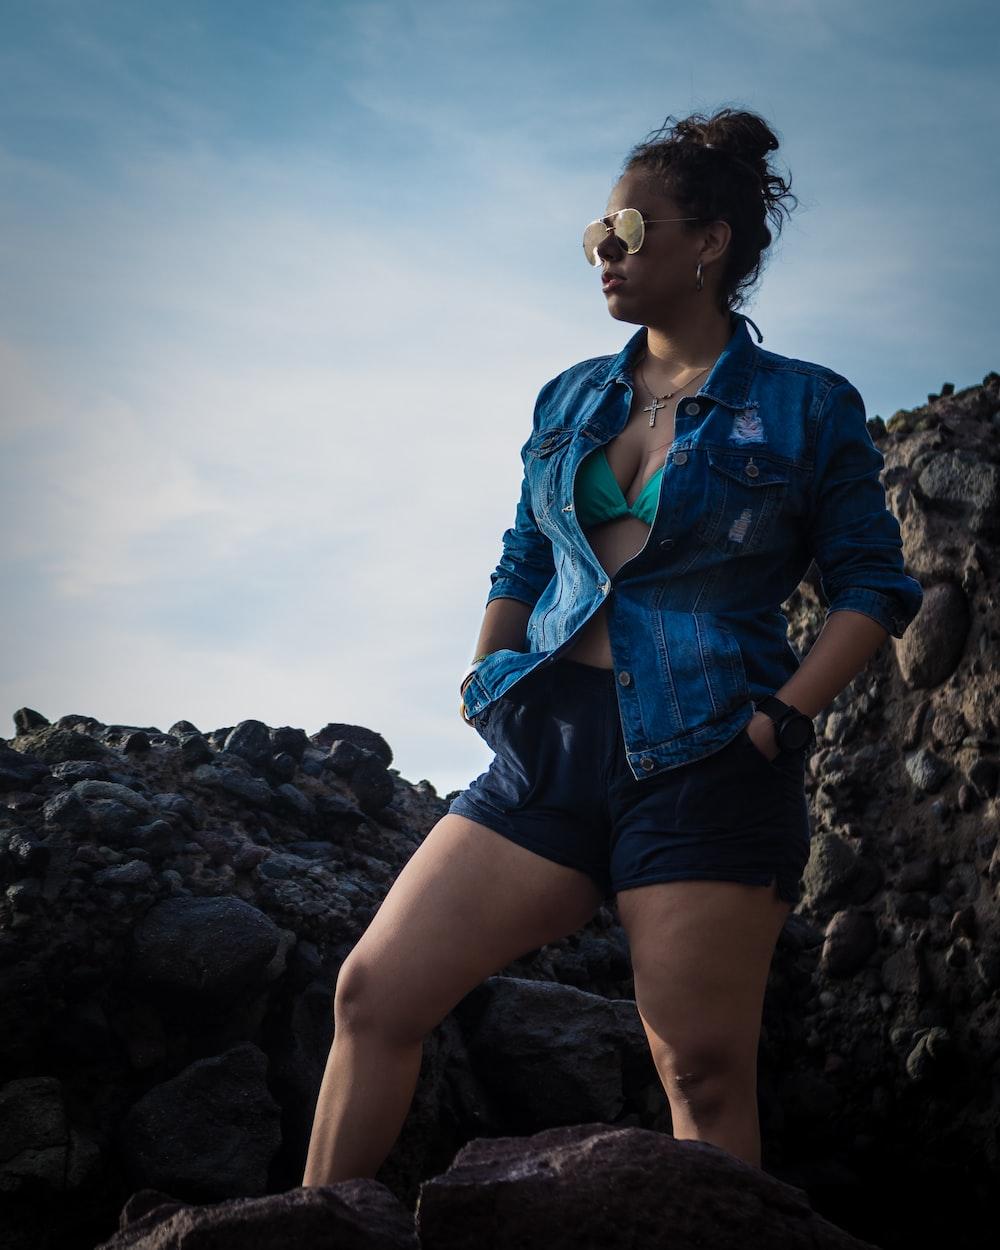 woman in blue button-up t-shirt standing near rocks